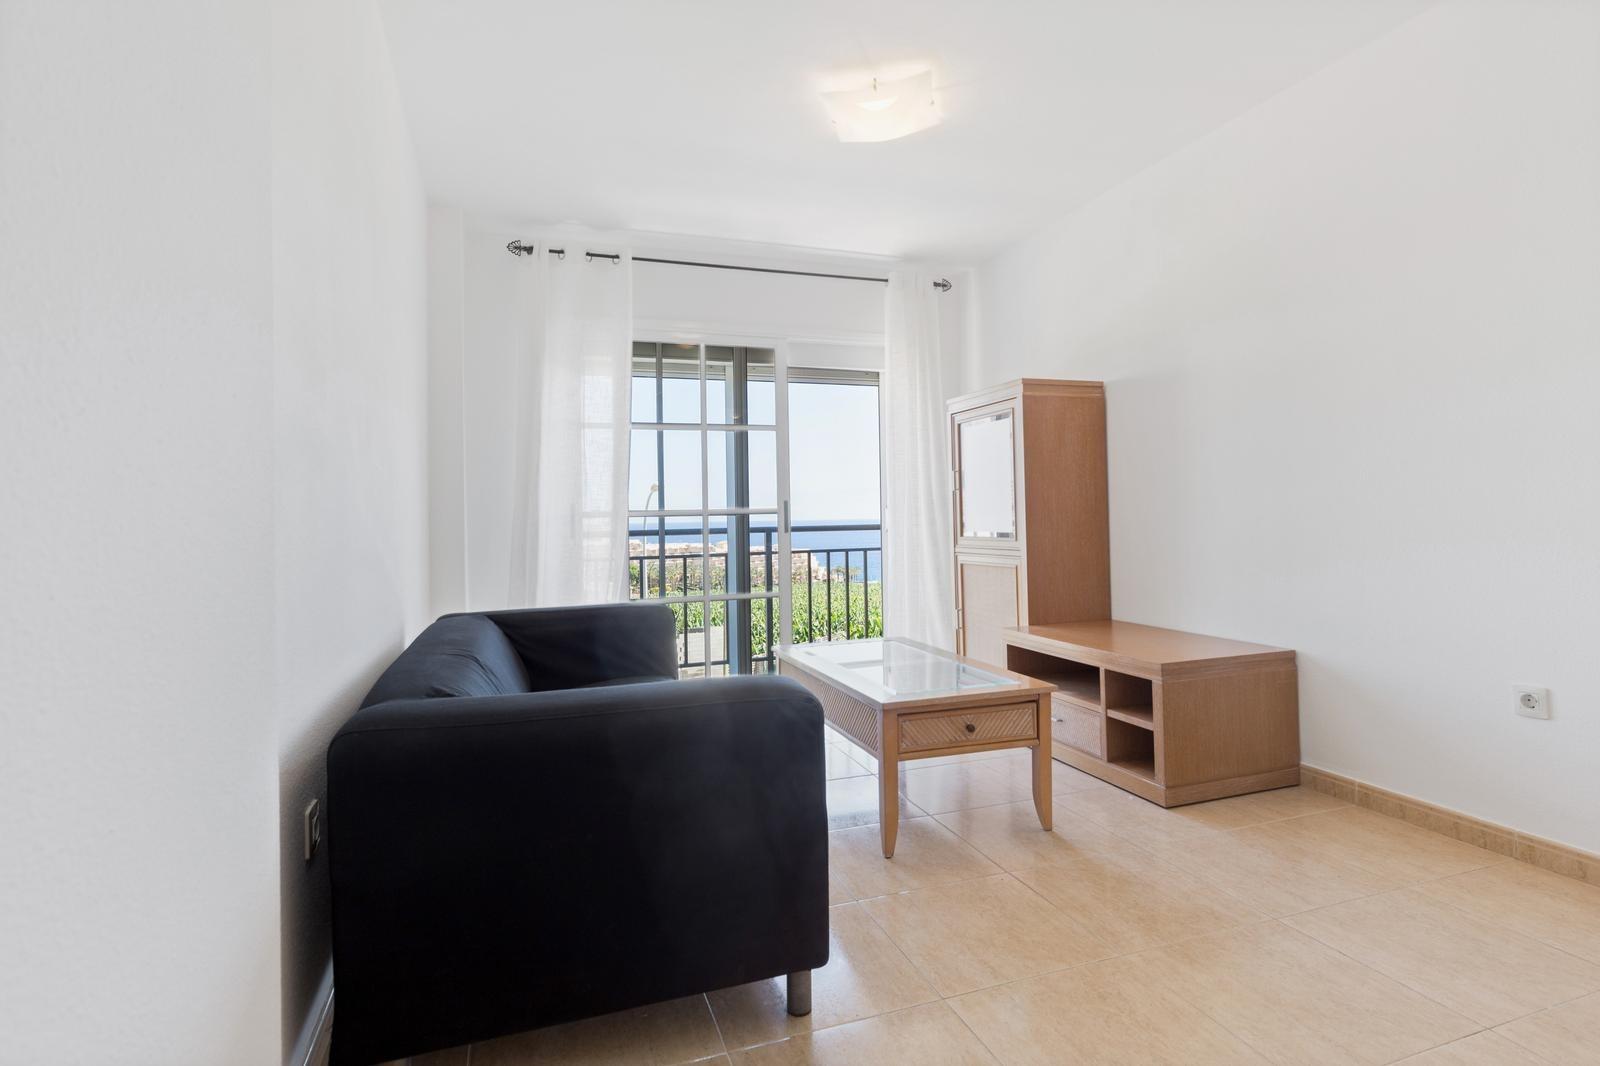 Appartement - Callao Salvaje - Arco Iris